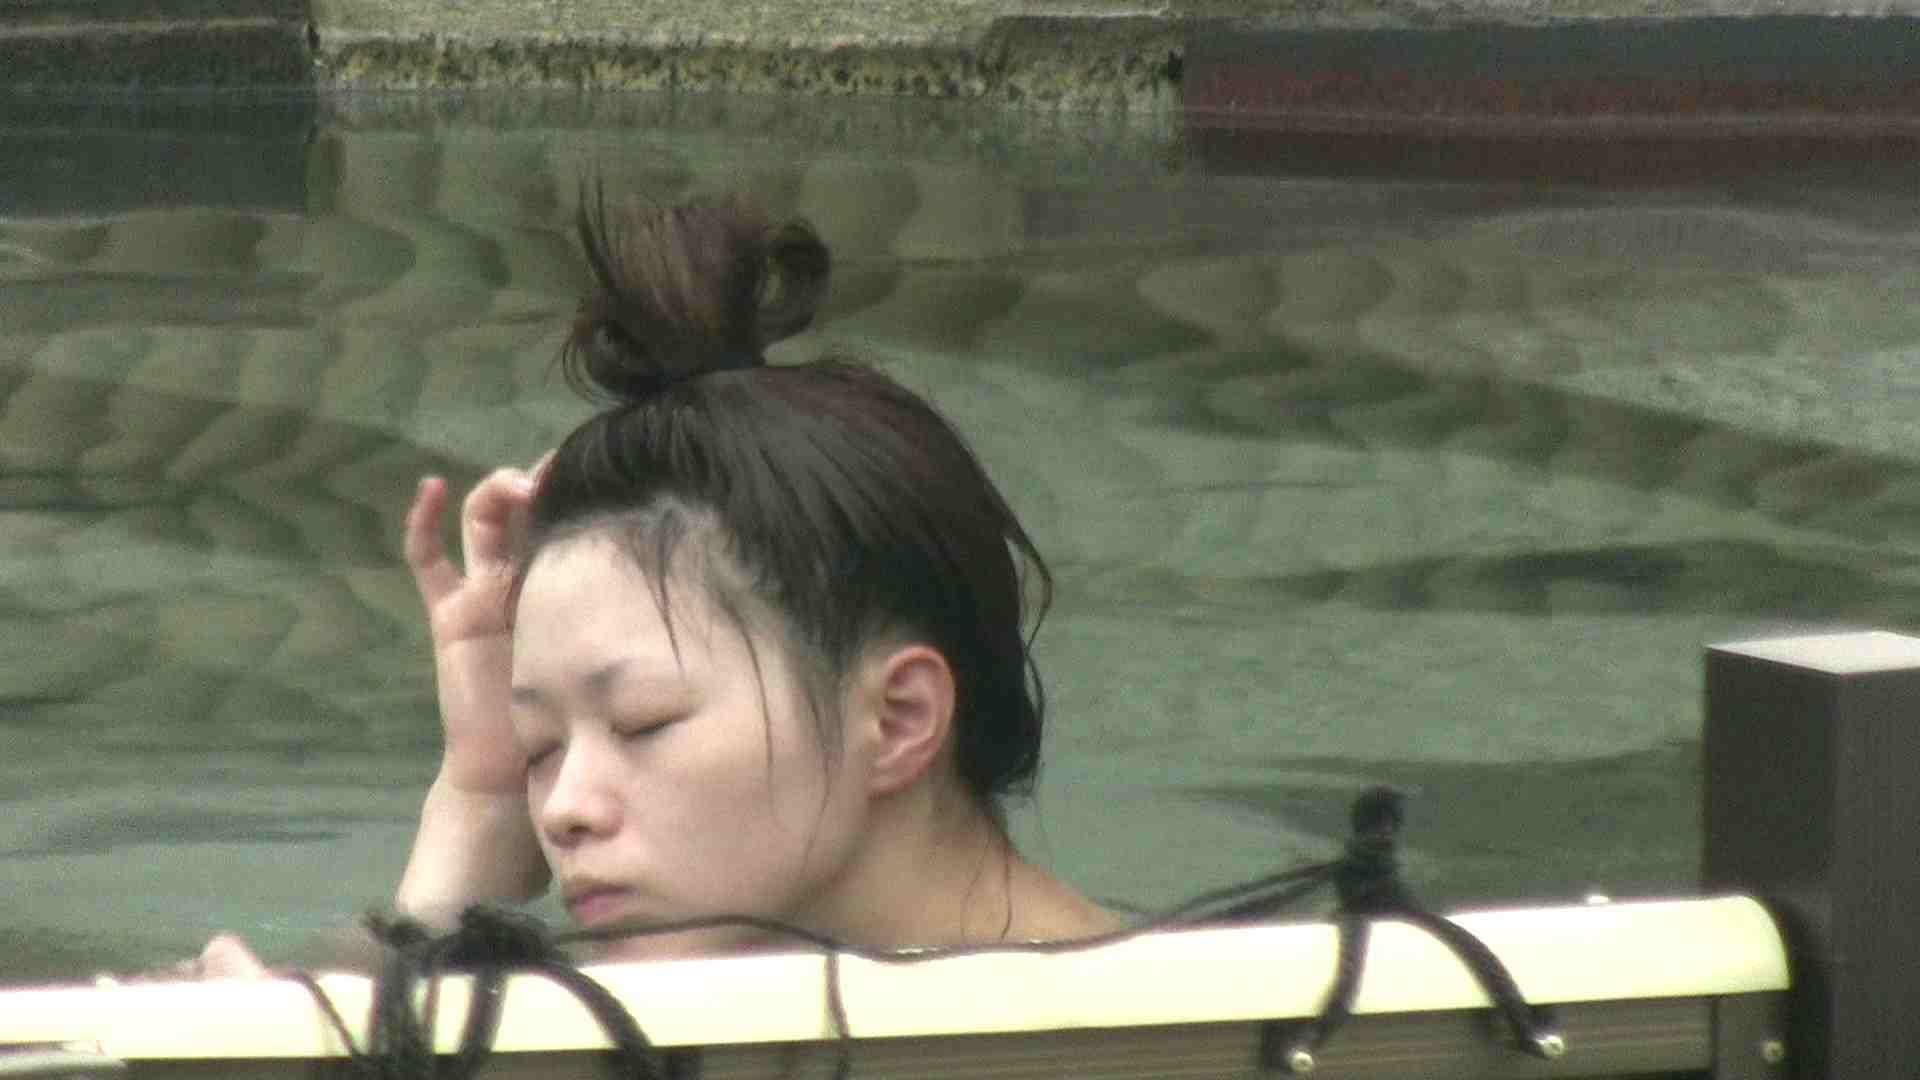 Aquaな露天風呂Vol.189 0   0  77連発 19